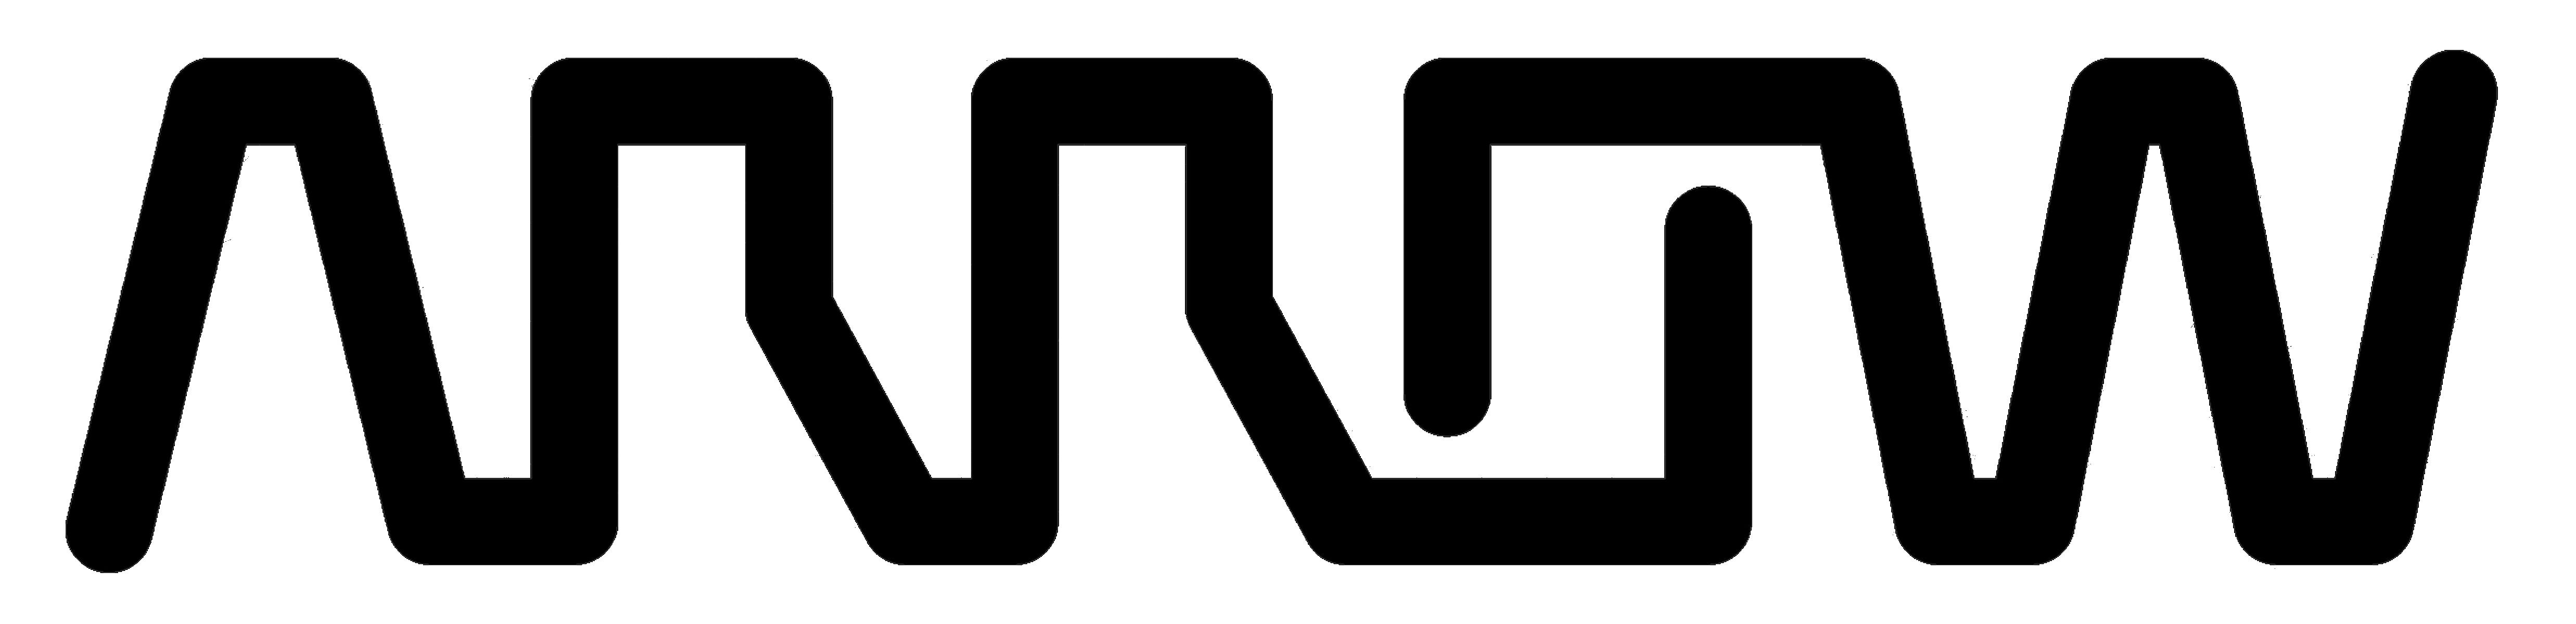 Logo Arrow PNG - 103559